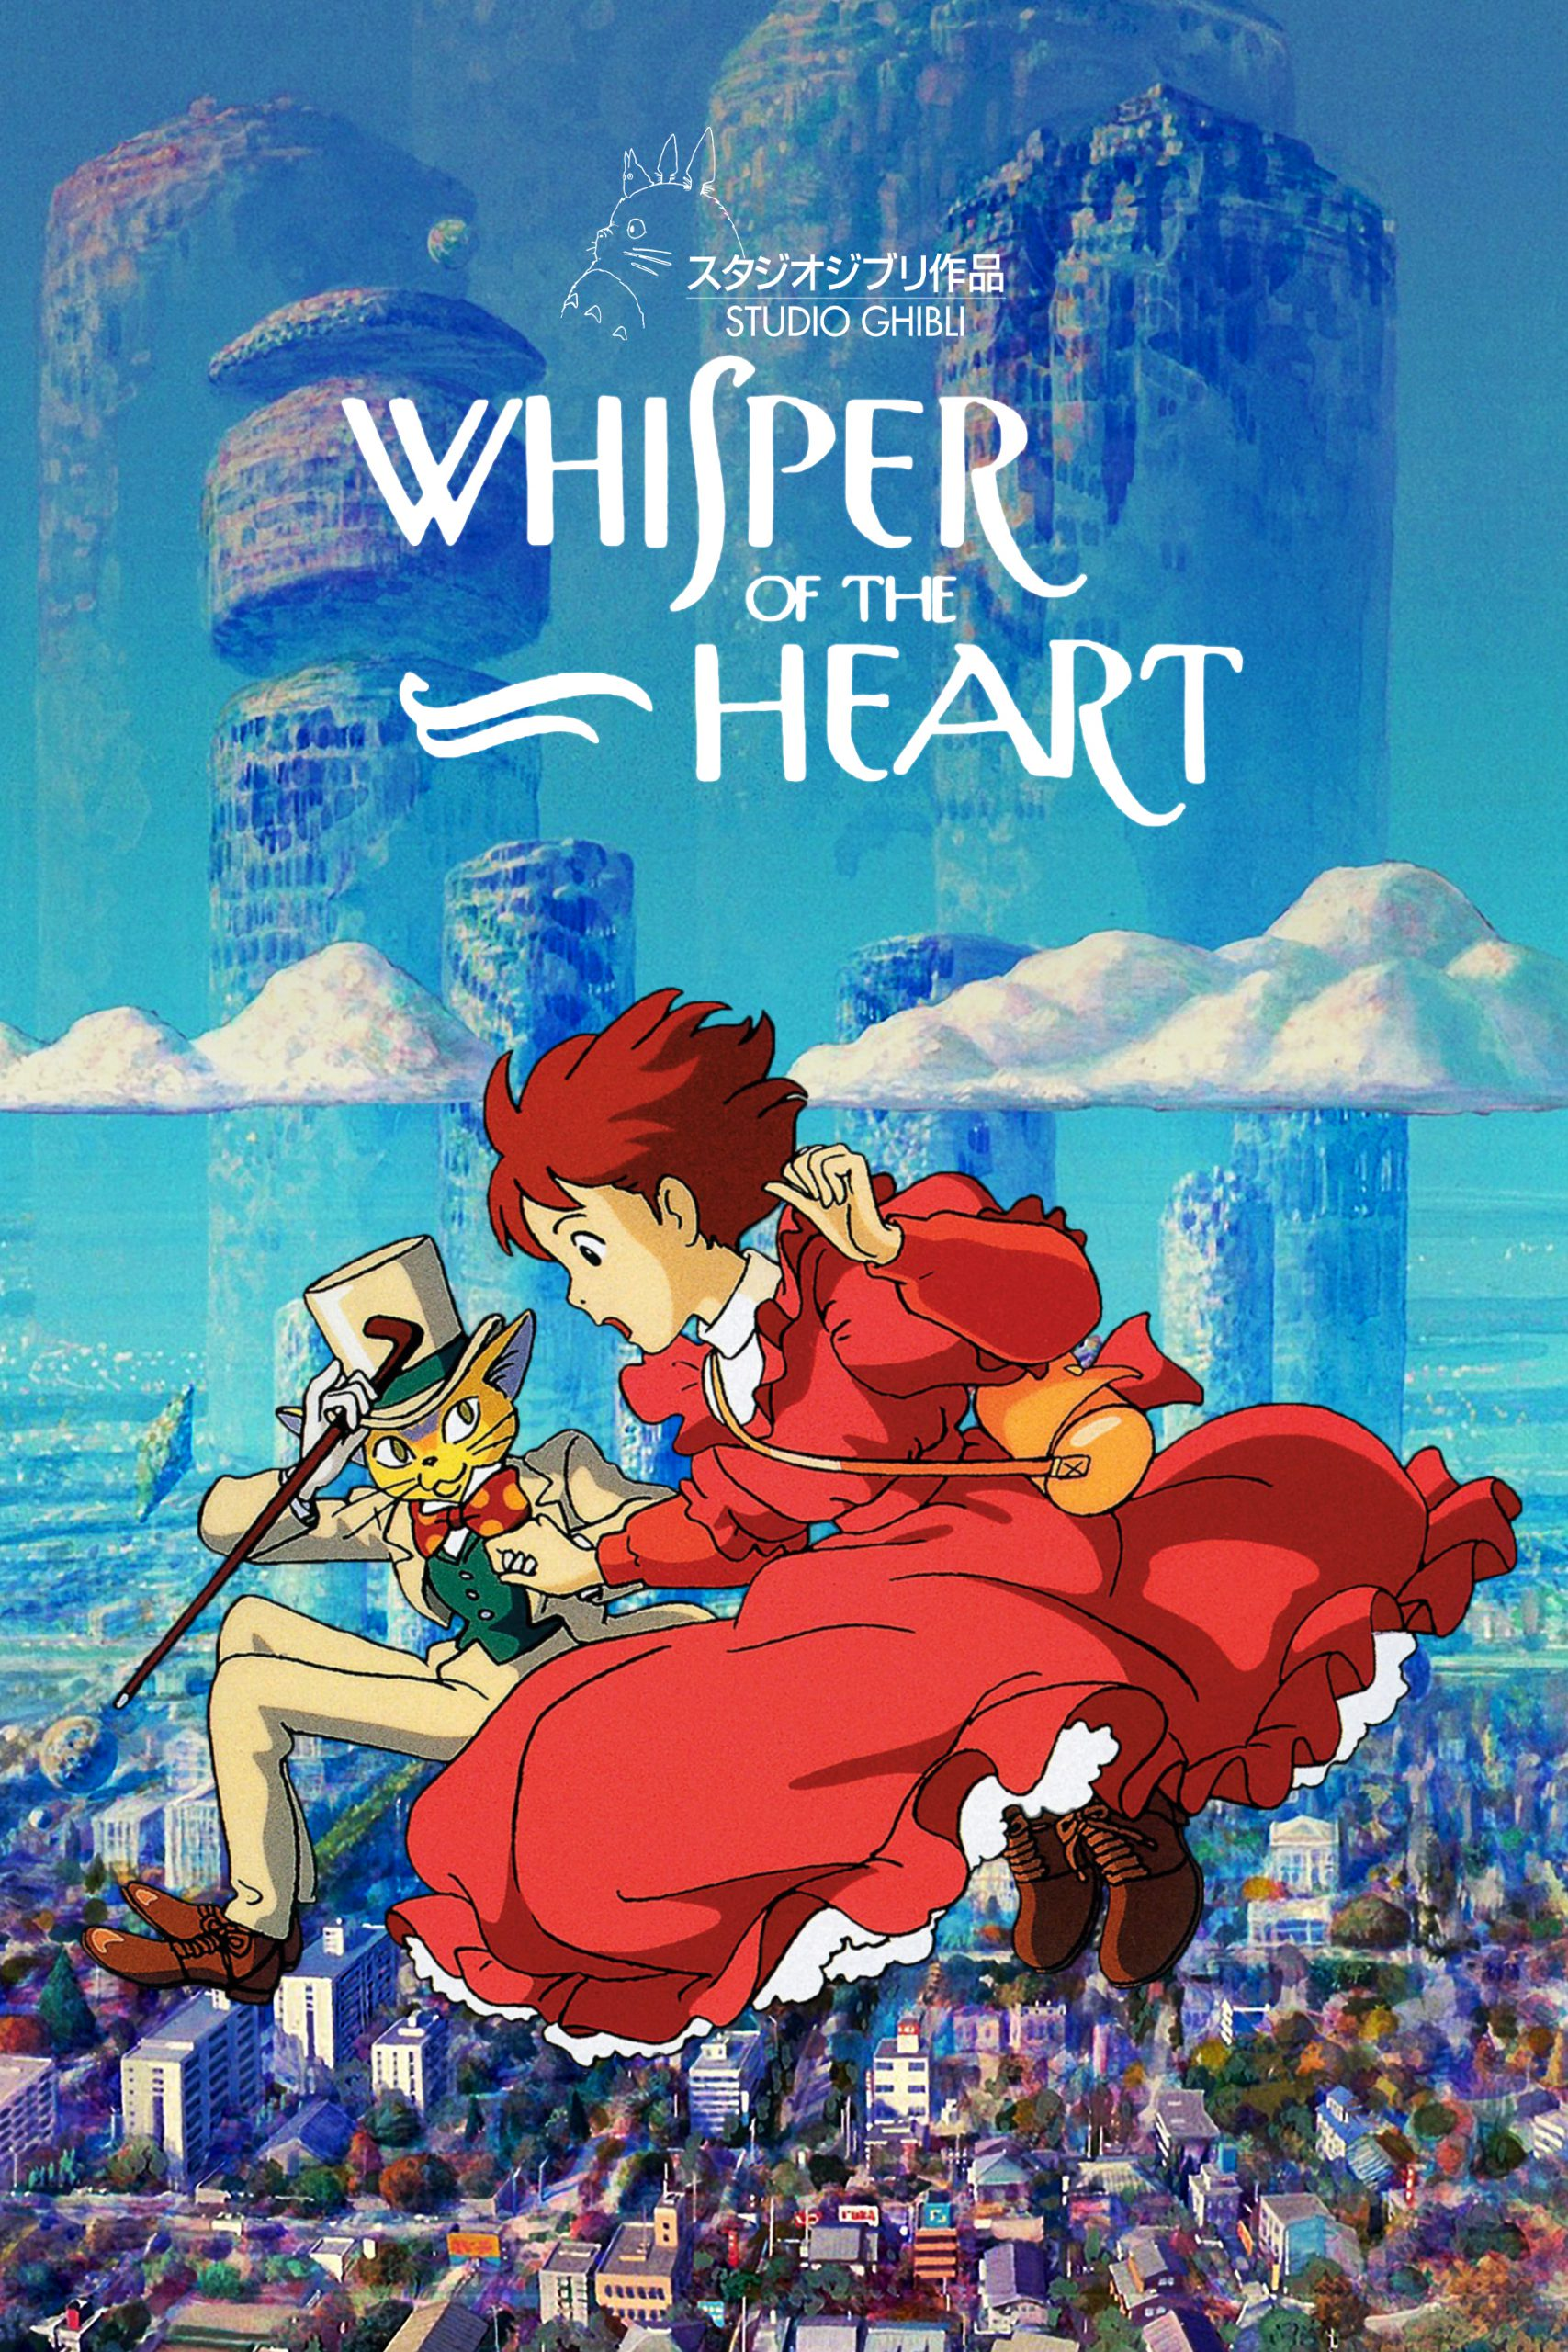 زمزمهٔ قلب Whisper of the Heart